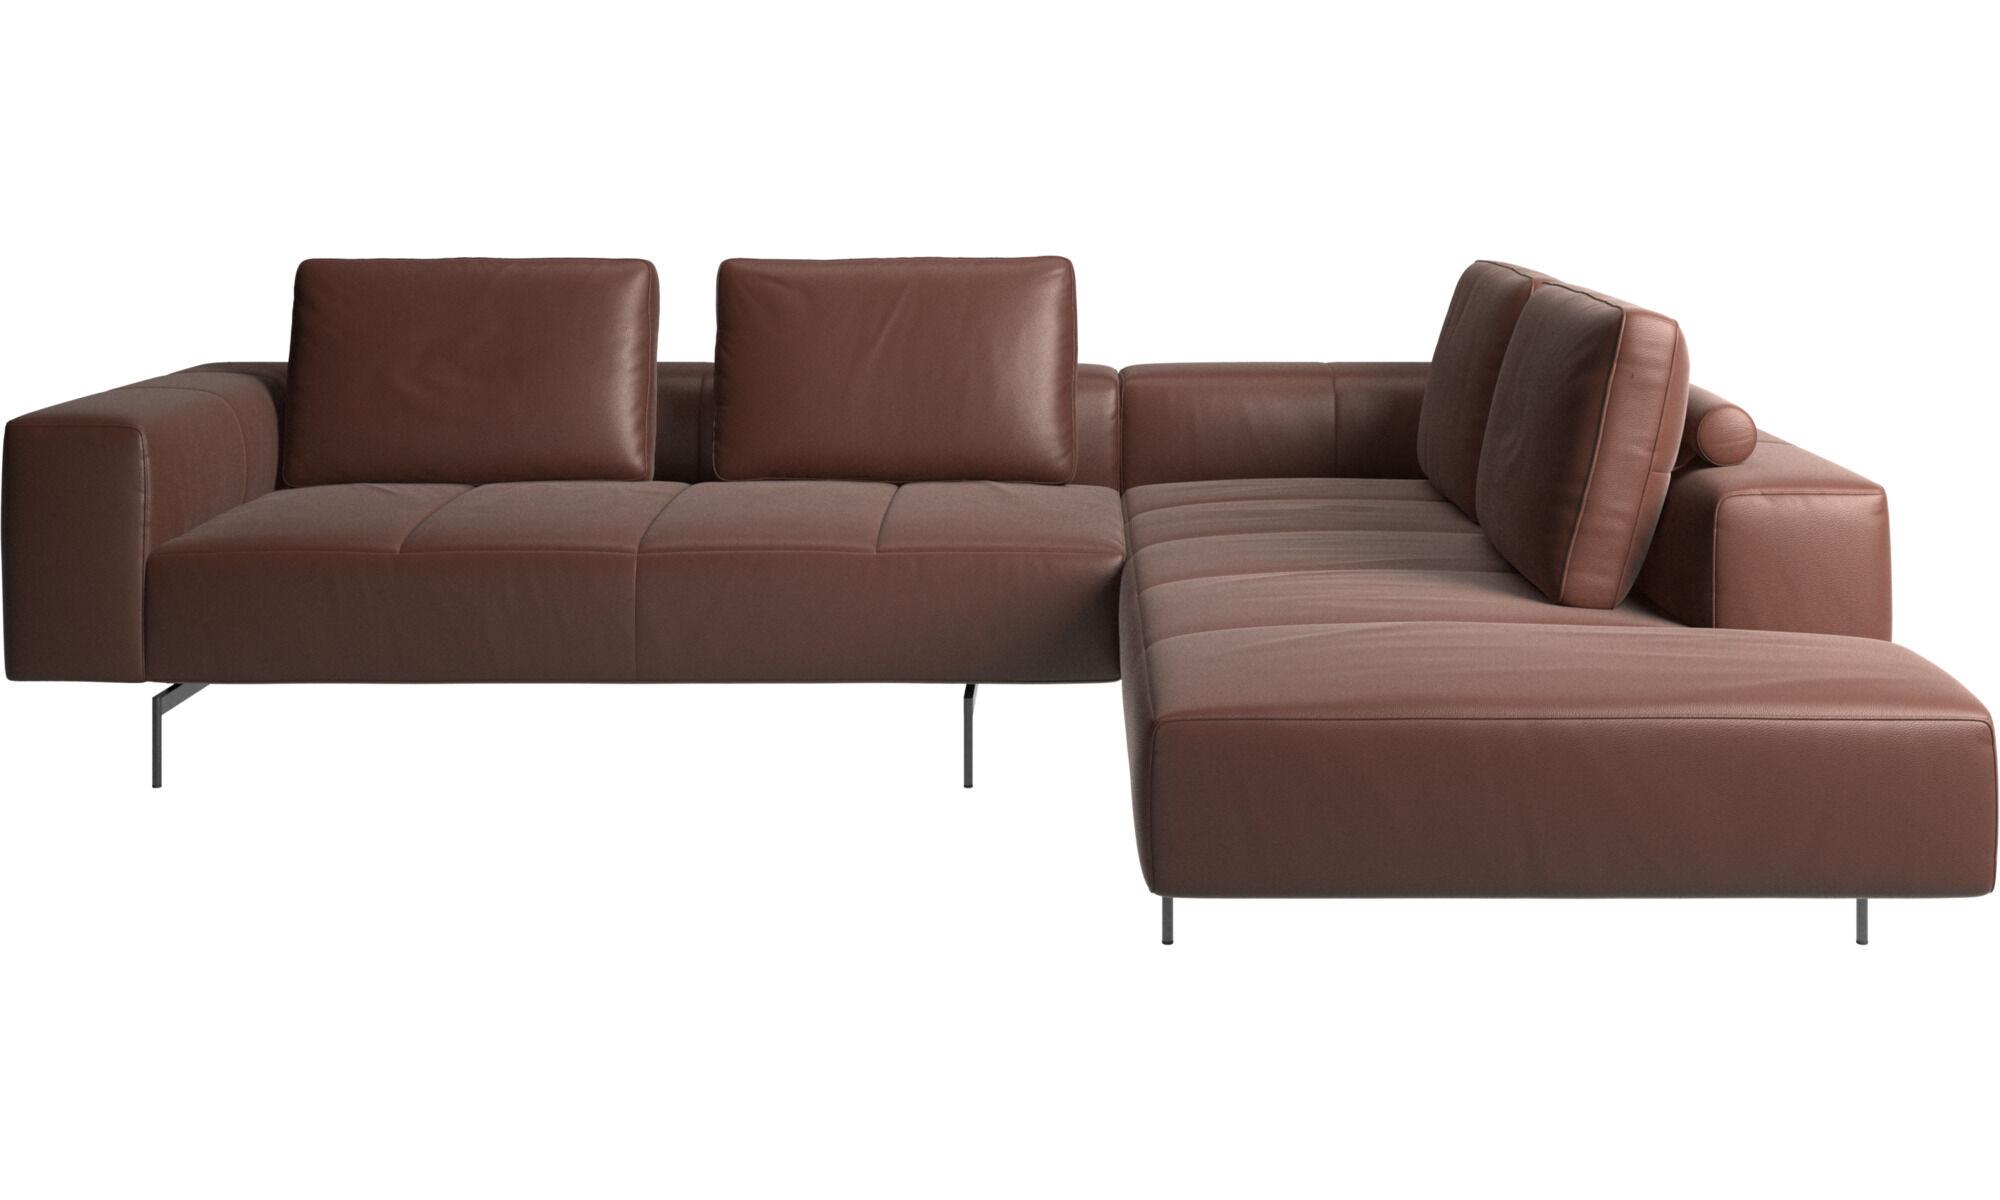 Amsterdam Ecksofa mit Lounge-Element